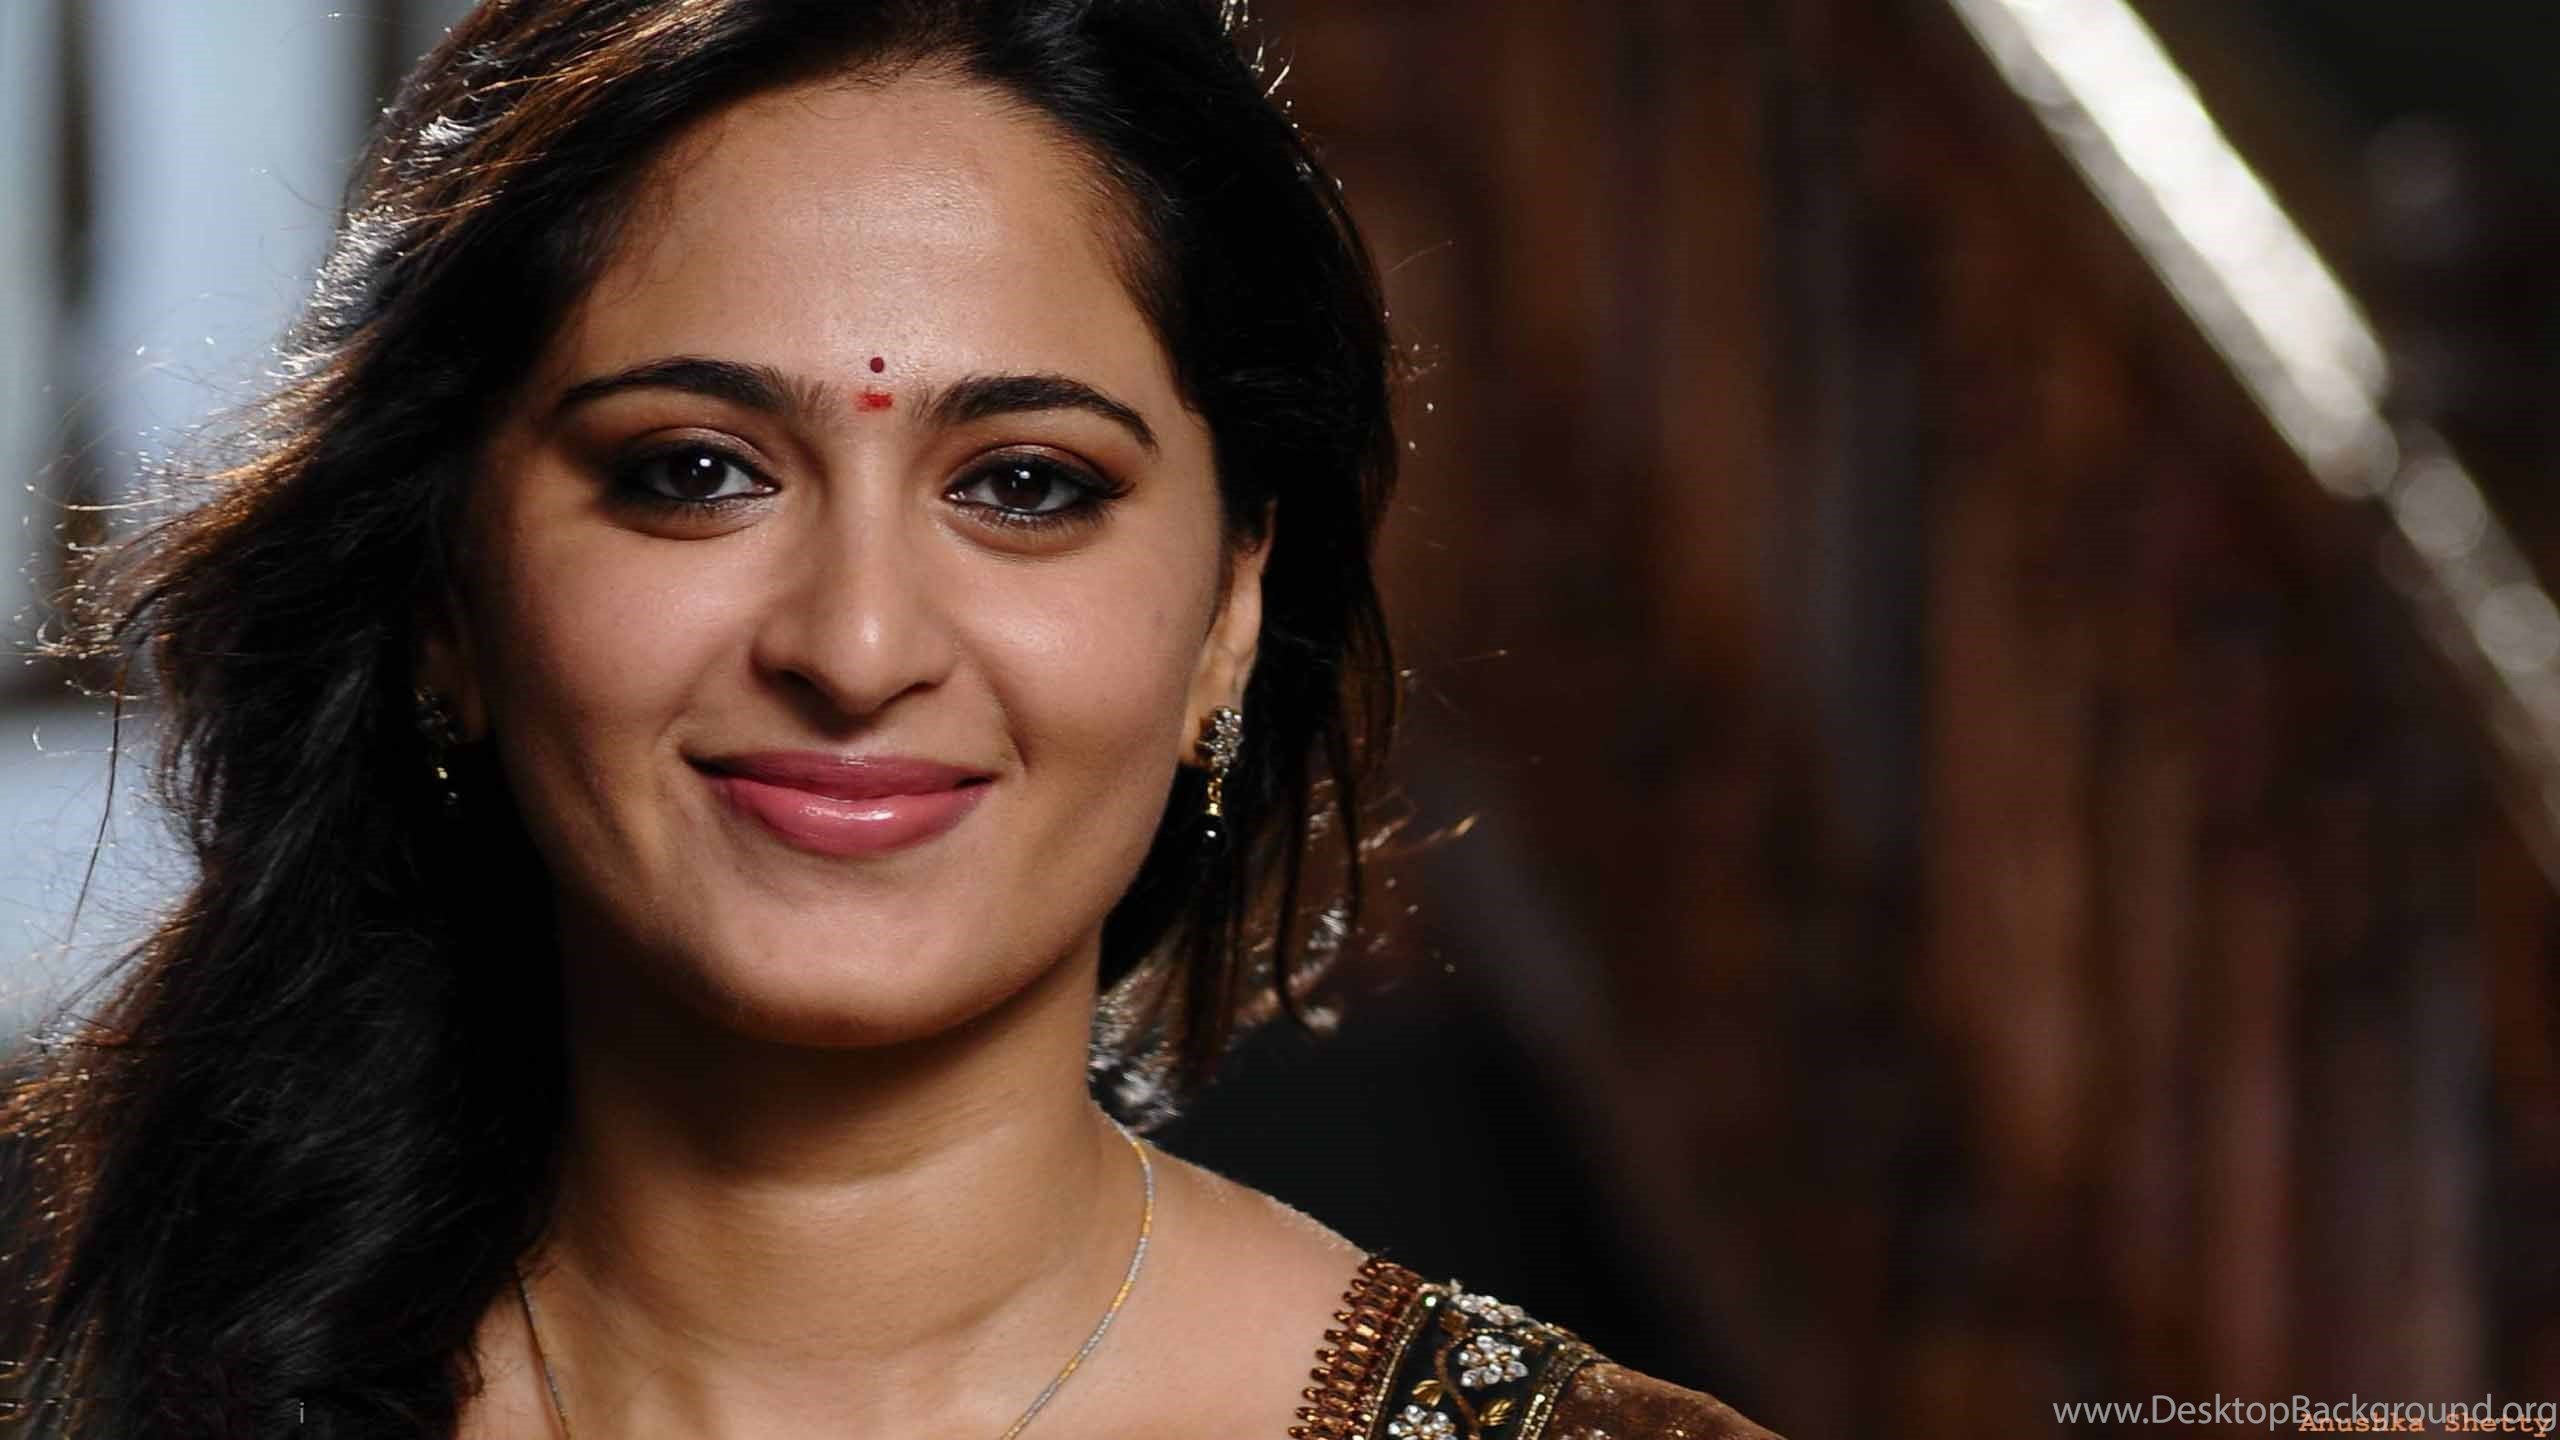 Anushka Shetty Natural Face Hd Wallpapers Desktop Background